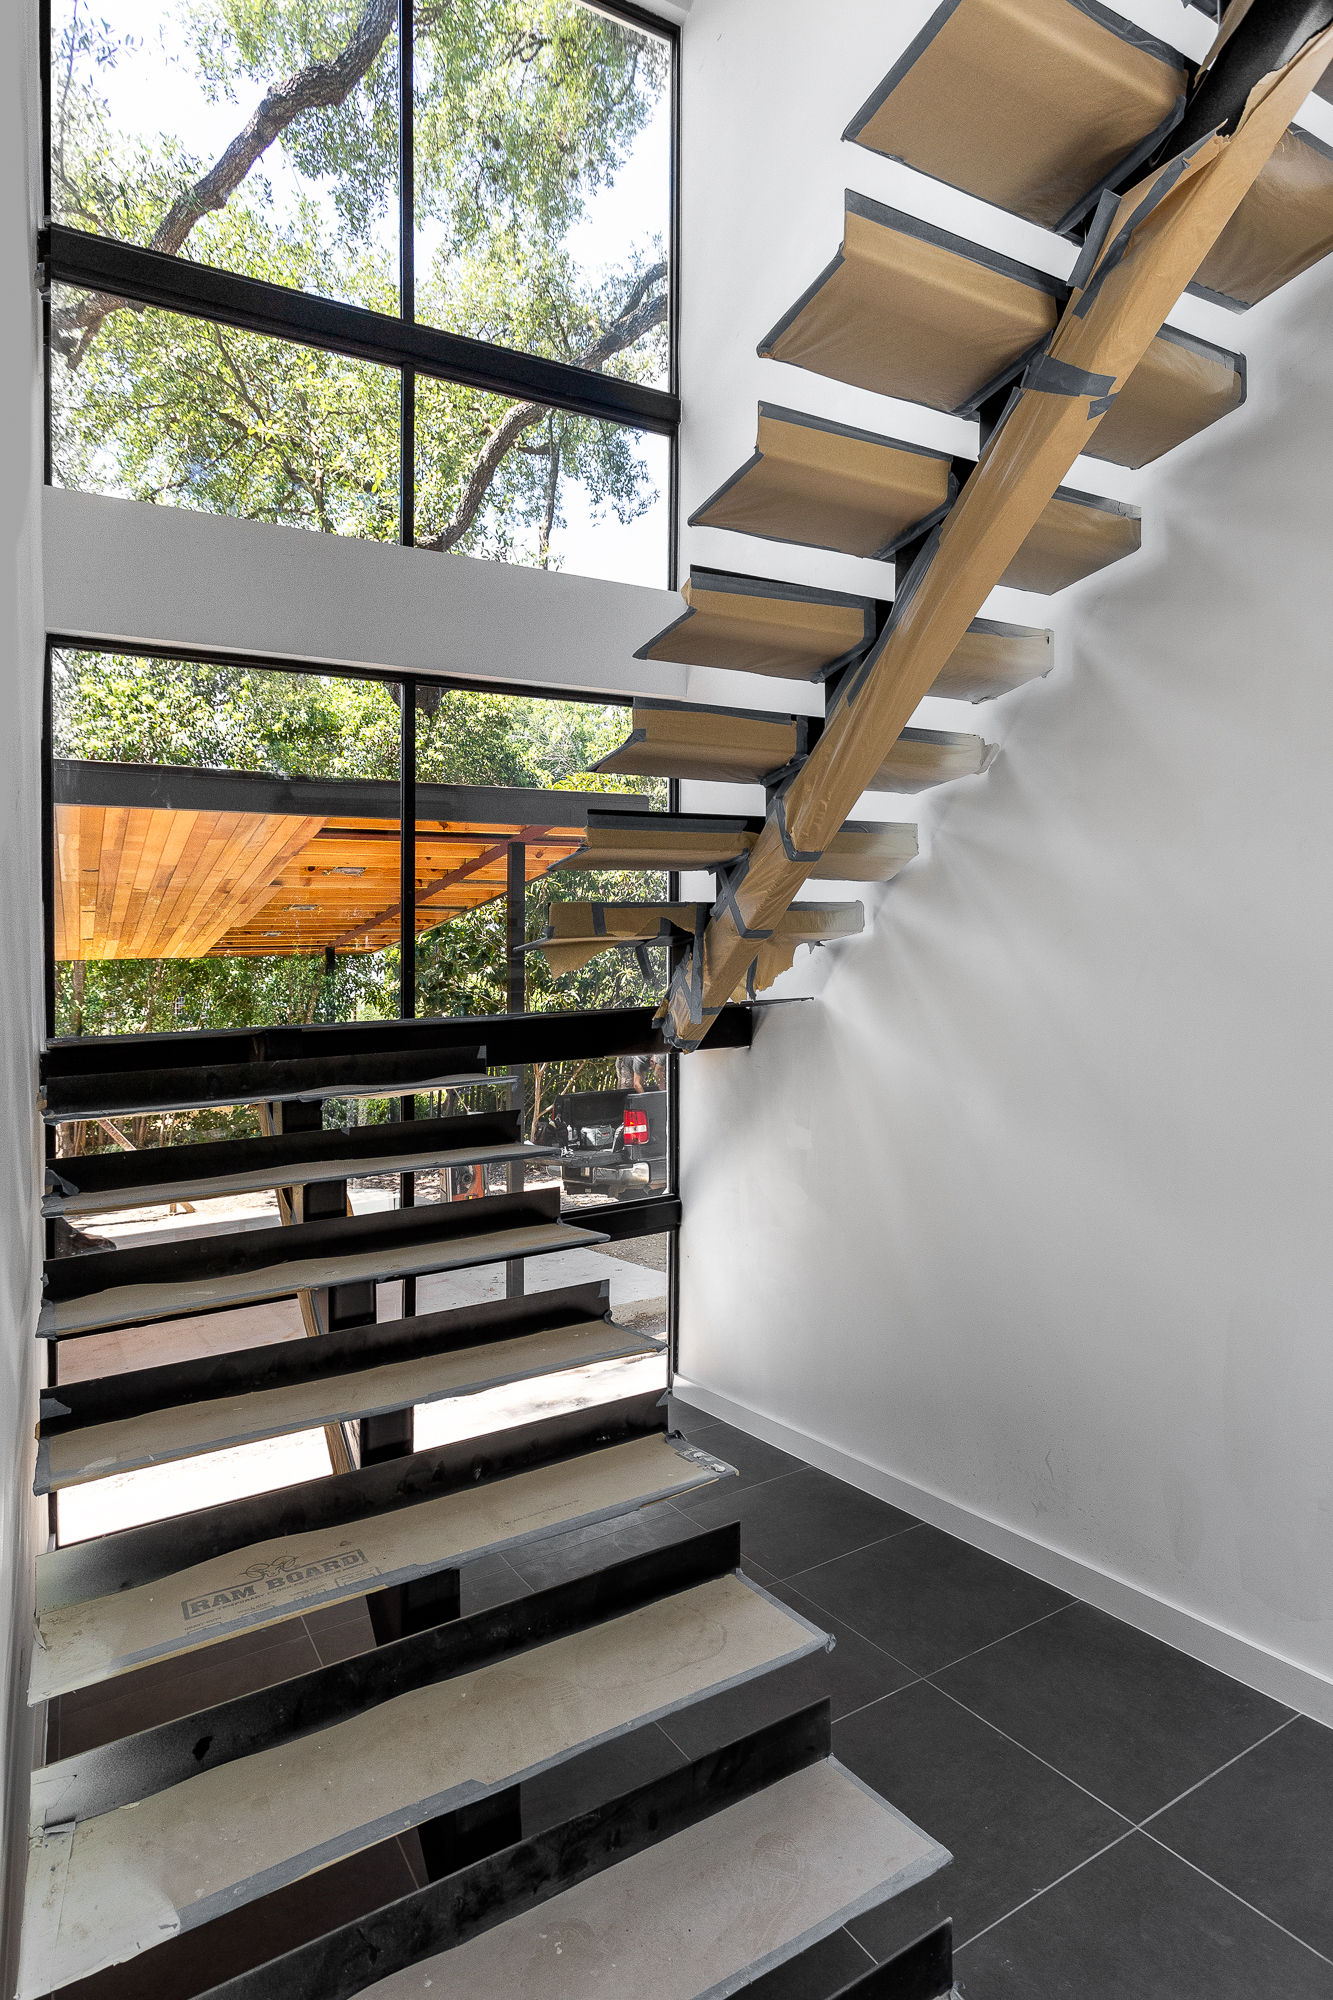 Woodridge-San-Antonio-Architecture-Photography-5.jpg